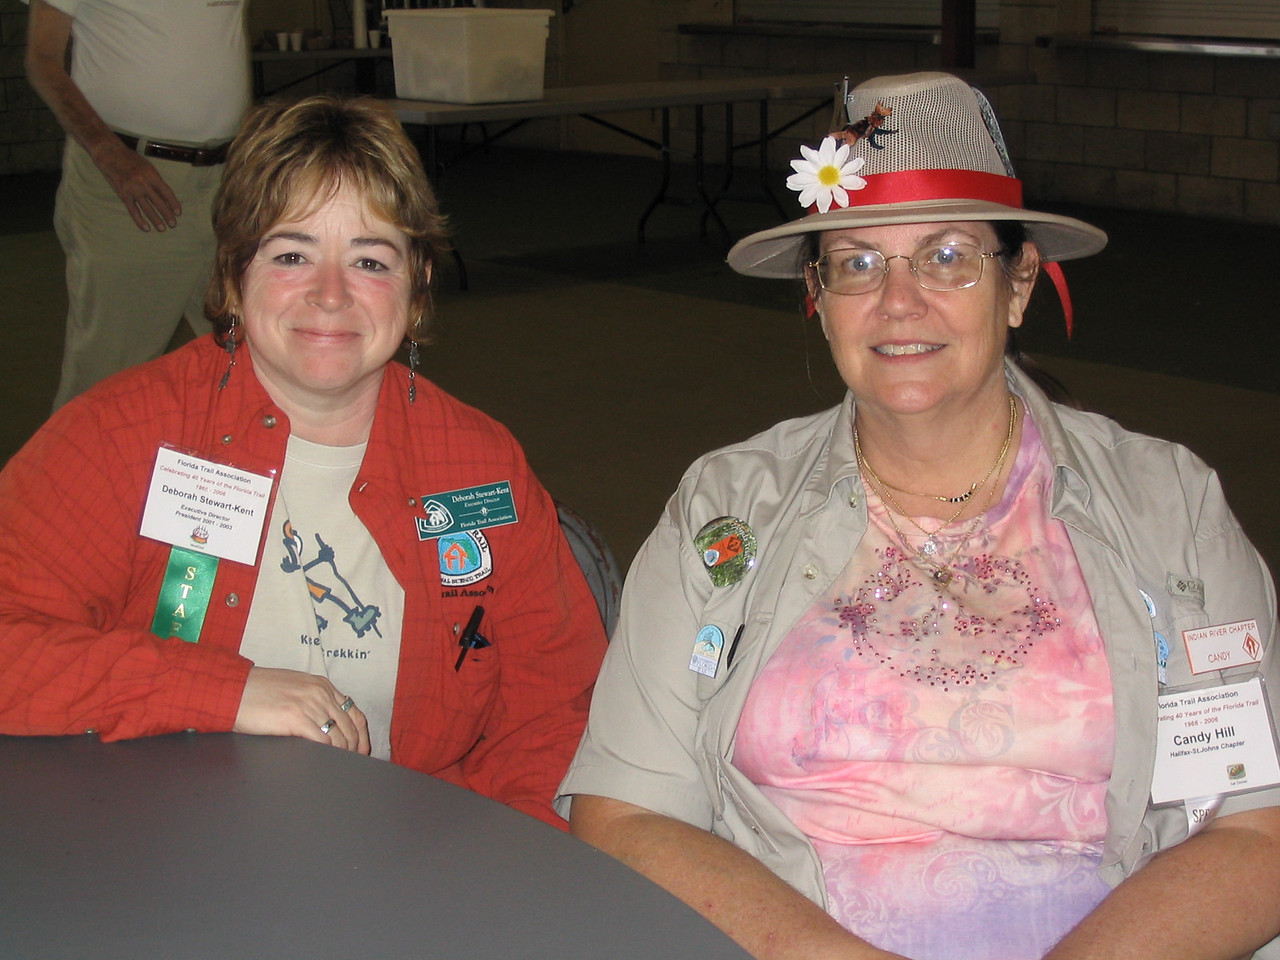 Executive Director Deborah Stewart-Kent and board member Candy Hill<br /> PHOTO CREDIT: Diane Wilkins / Florida Trail Association